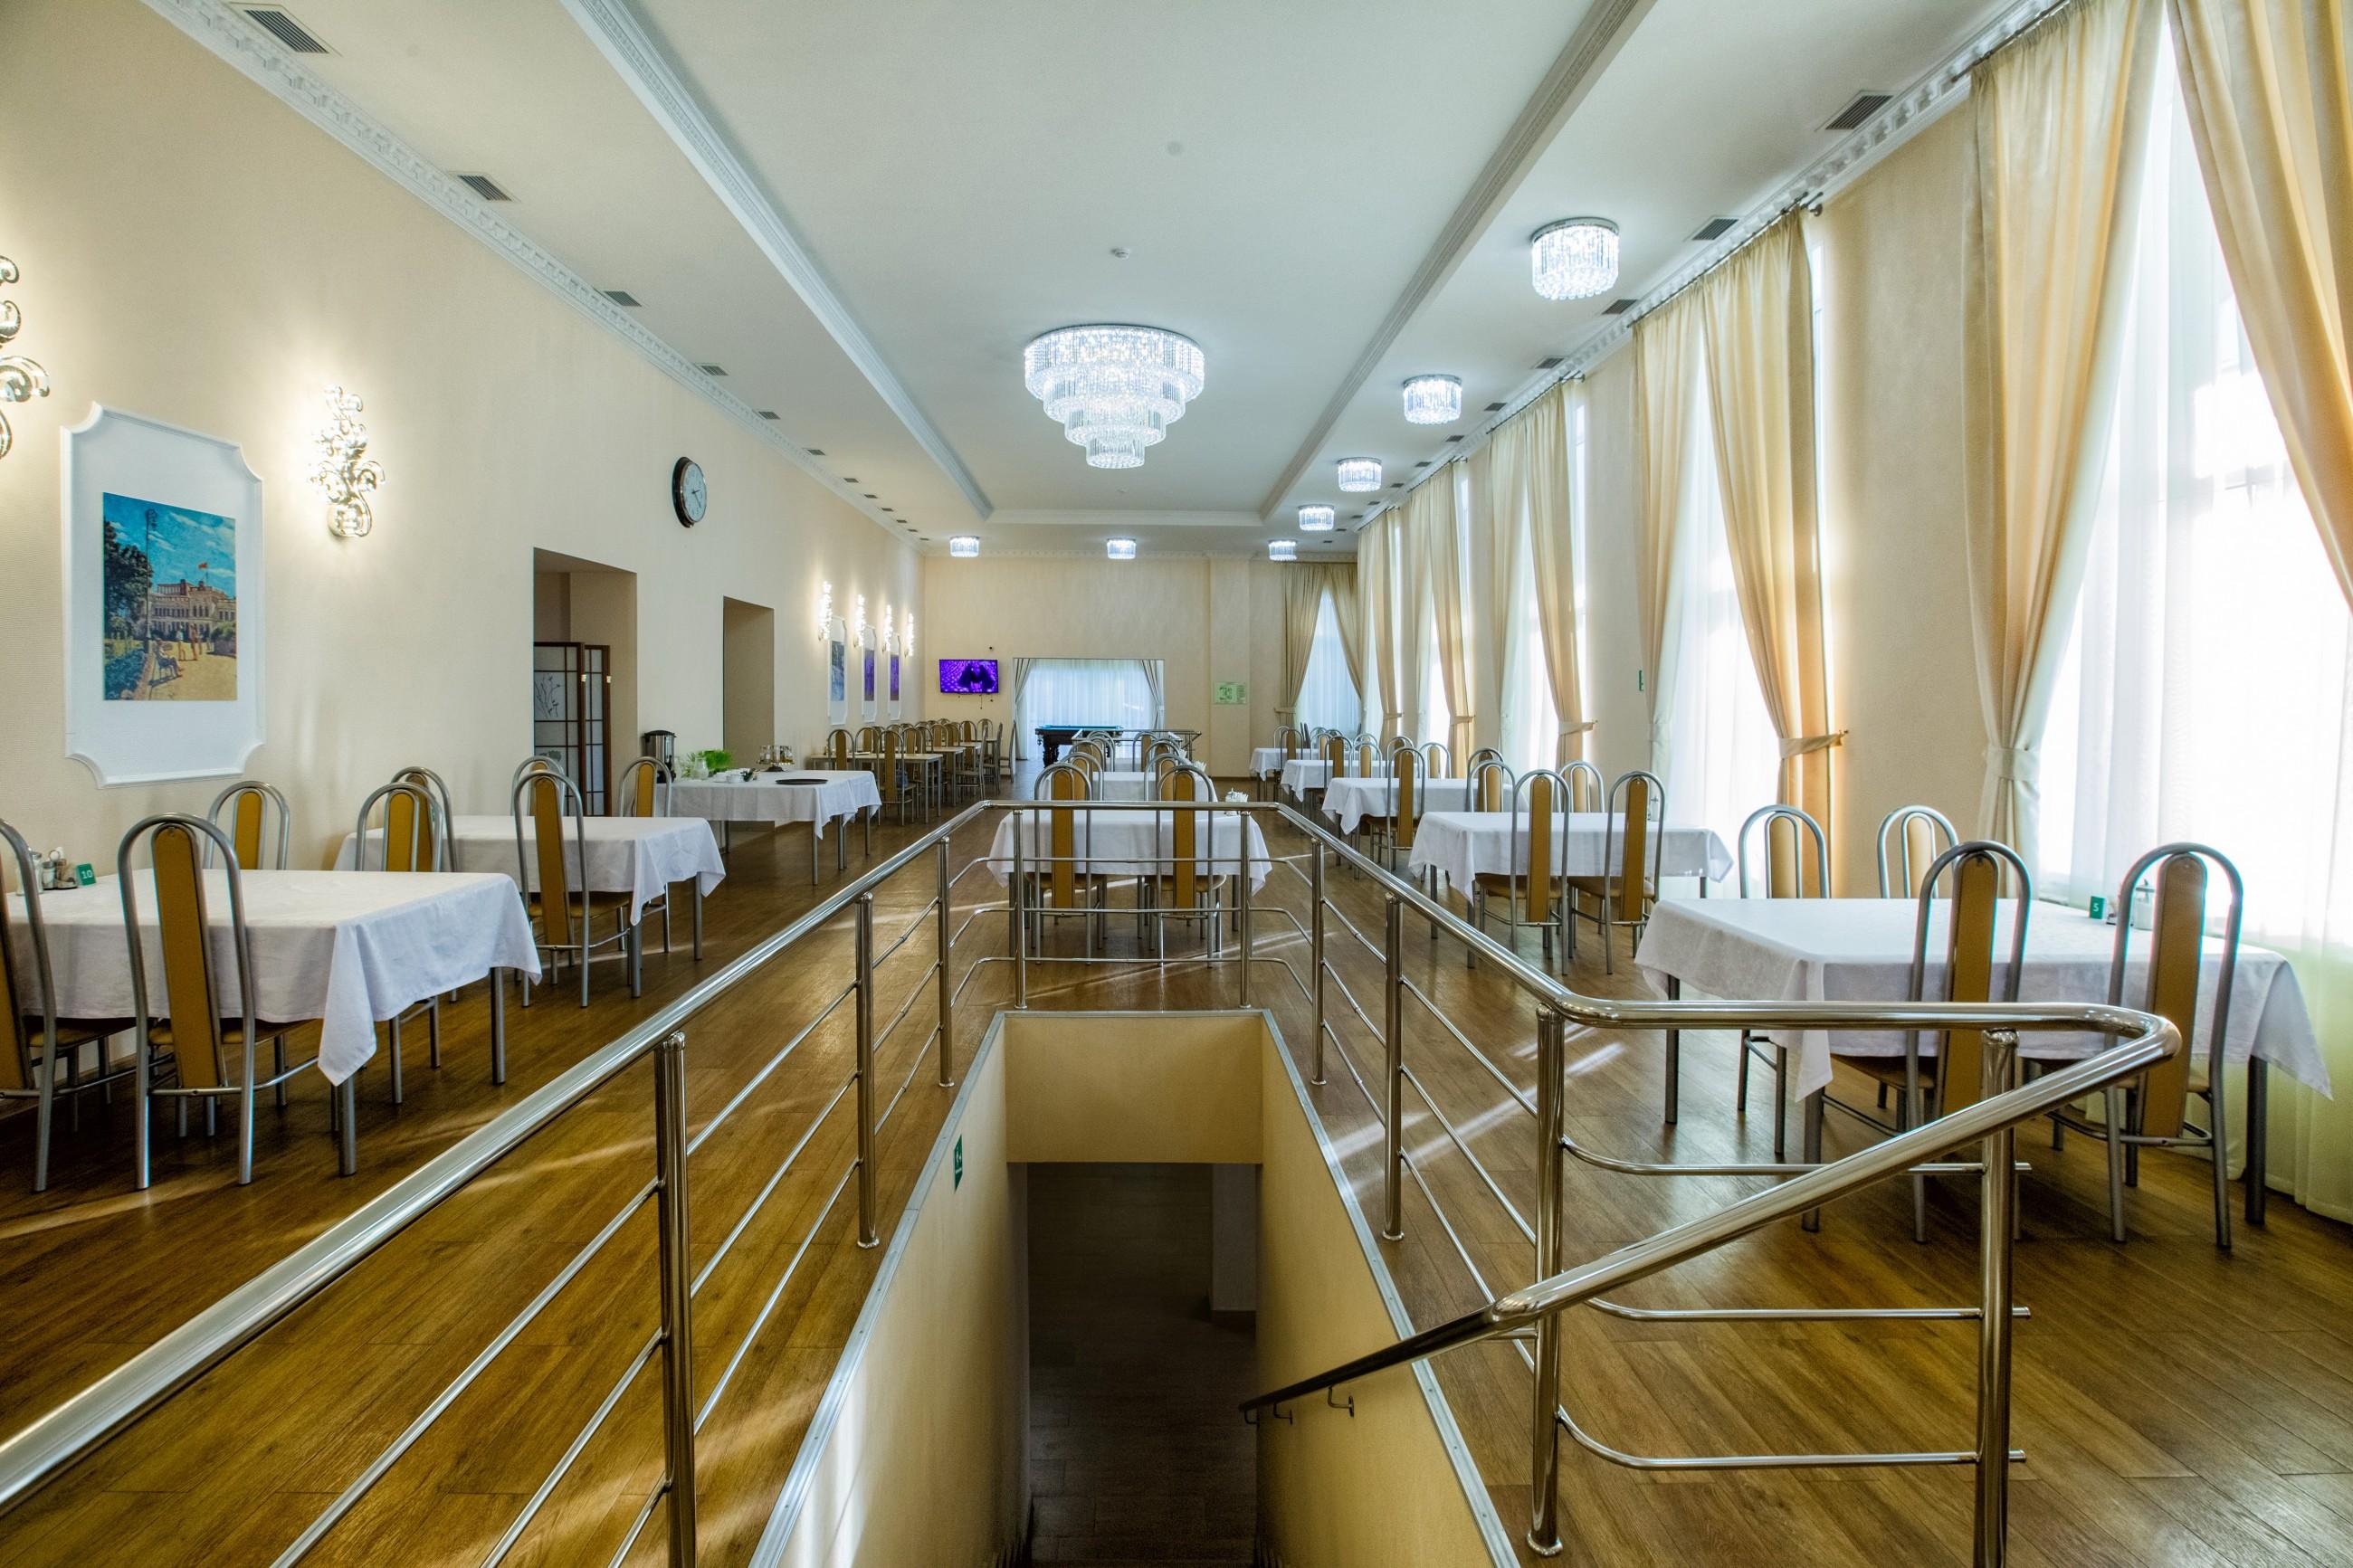 Капри диван ульяновская фабрика мебели фото вот